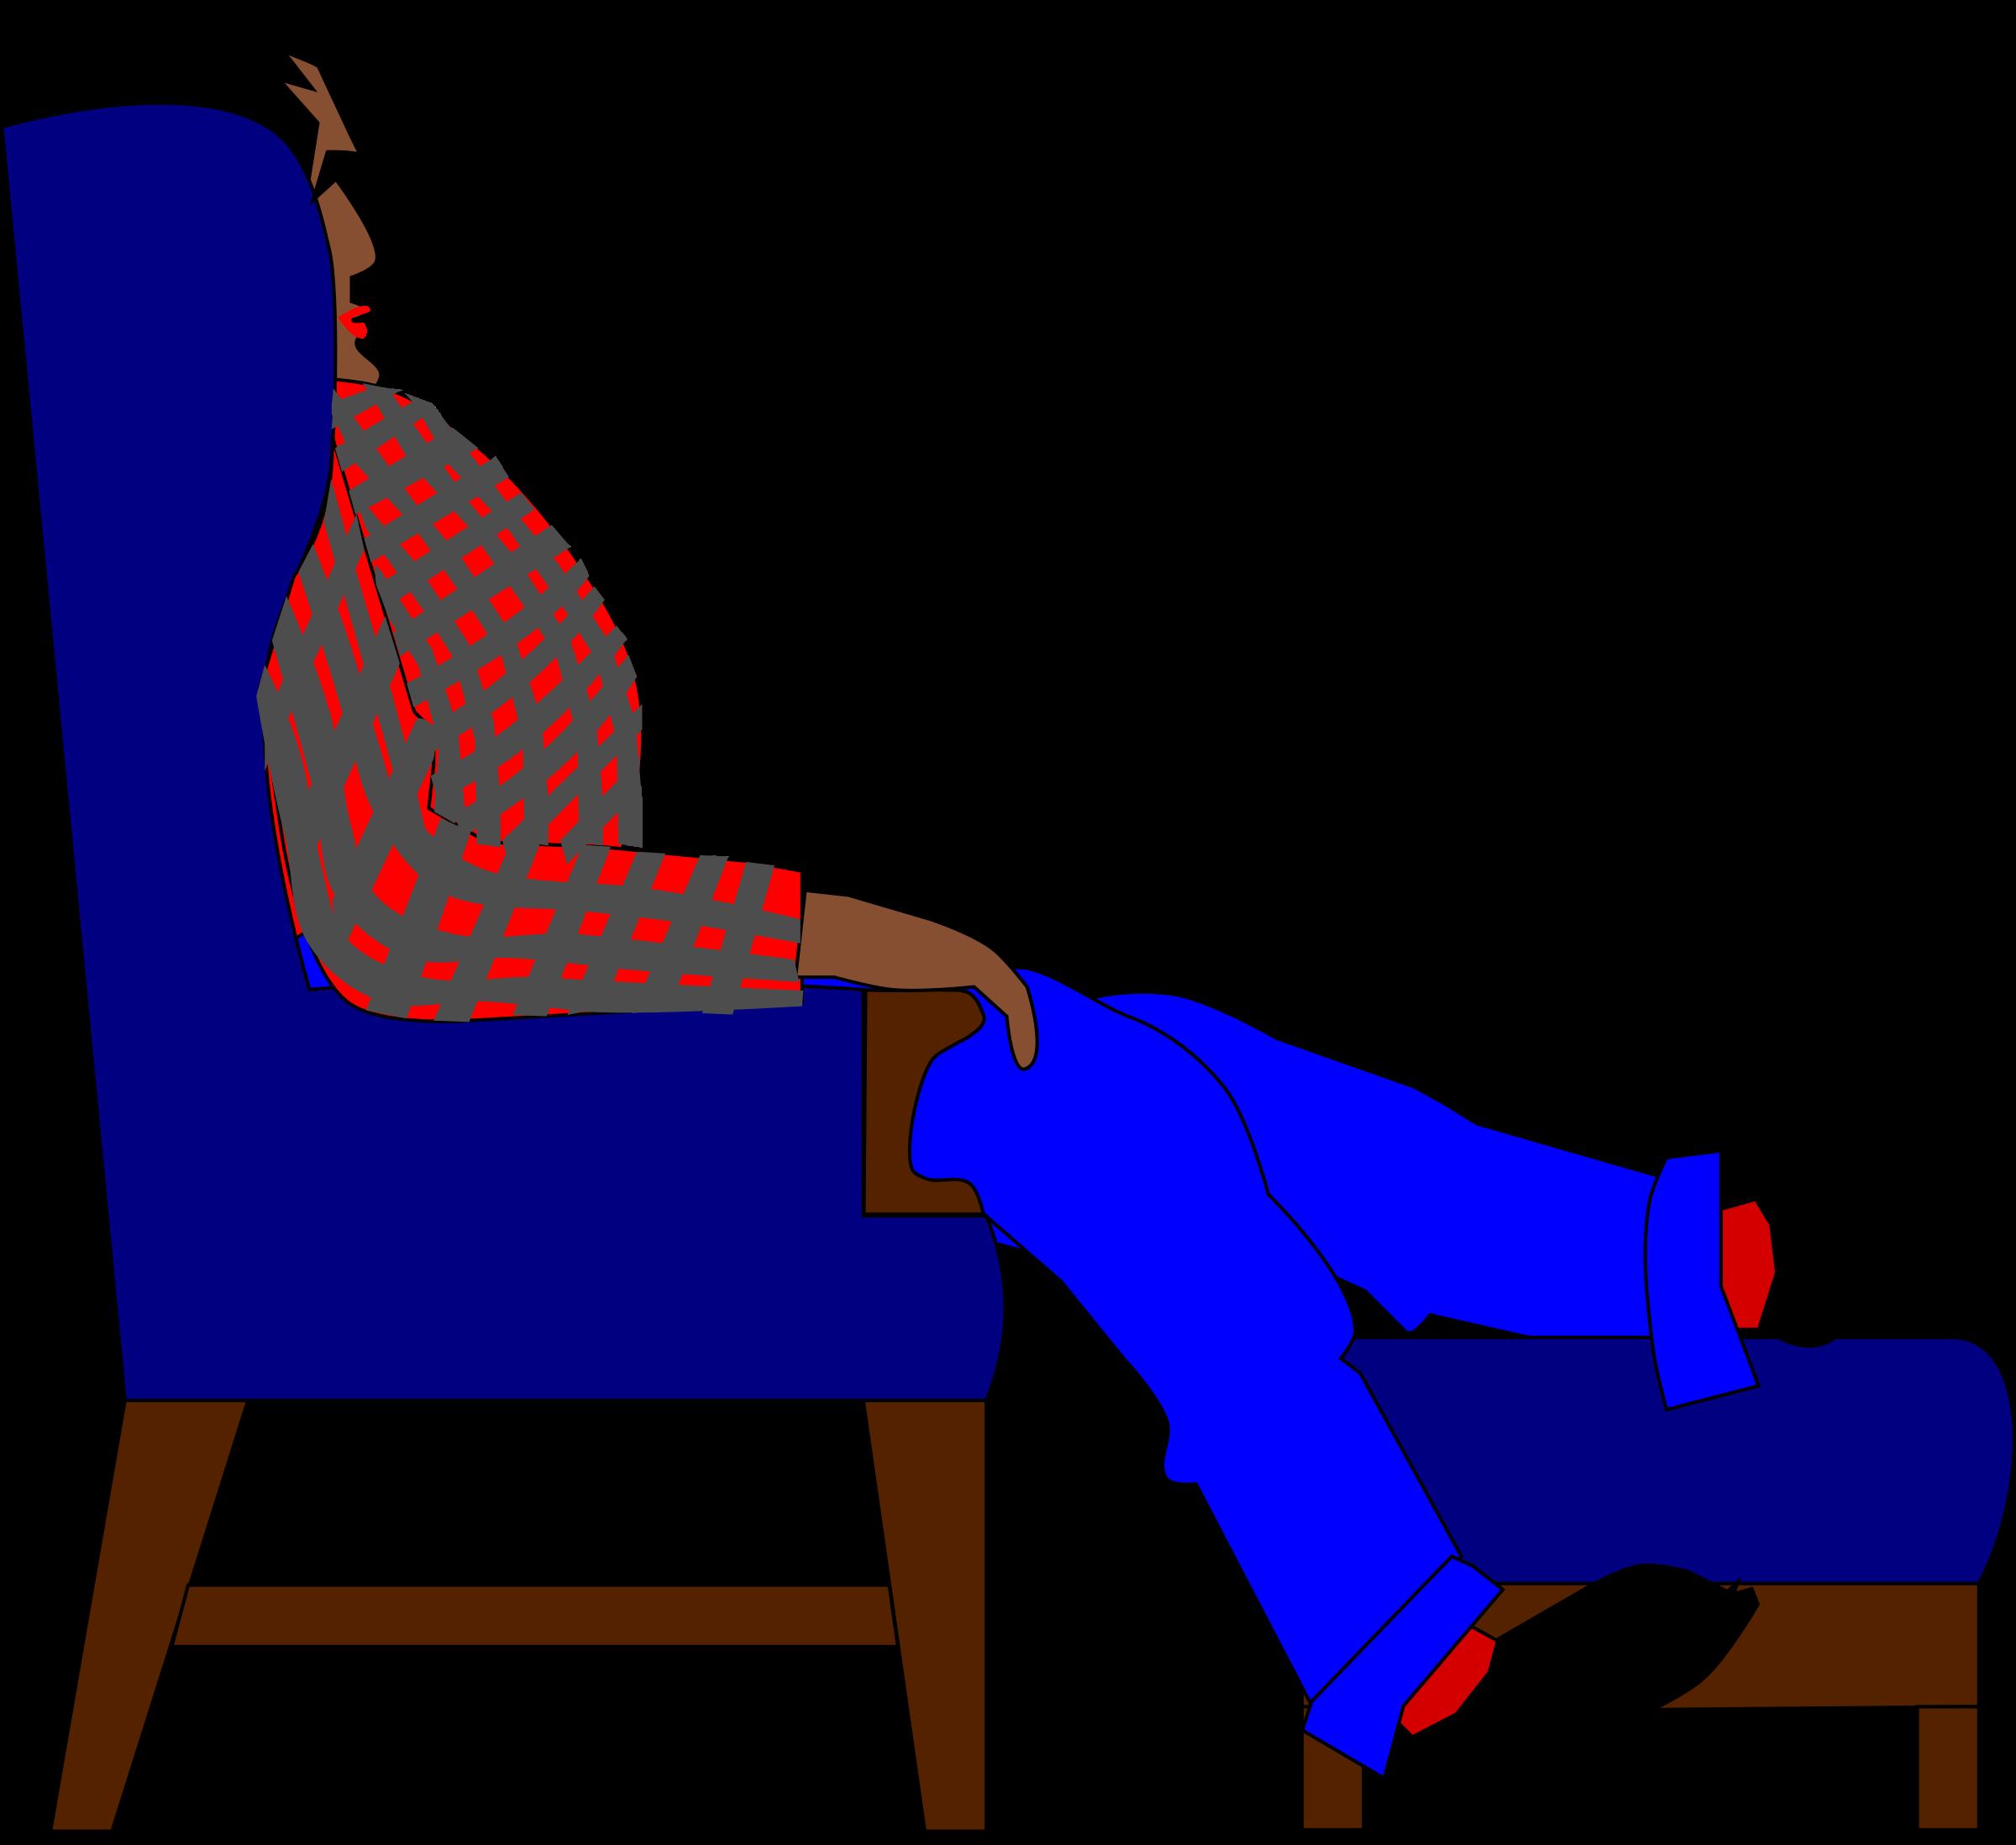 Furniture clipart easy chair. Man in an easychair